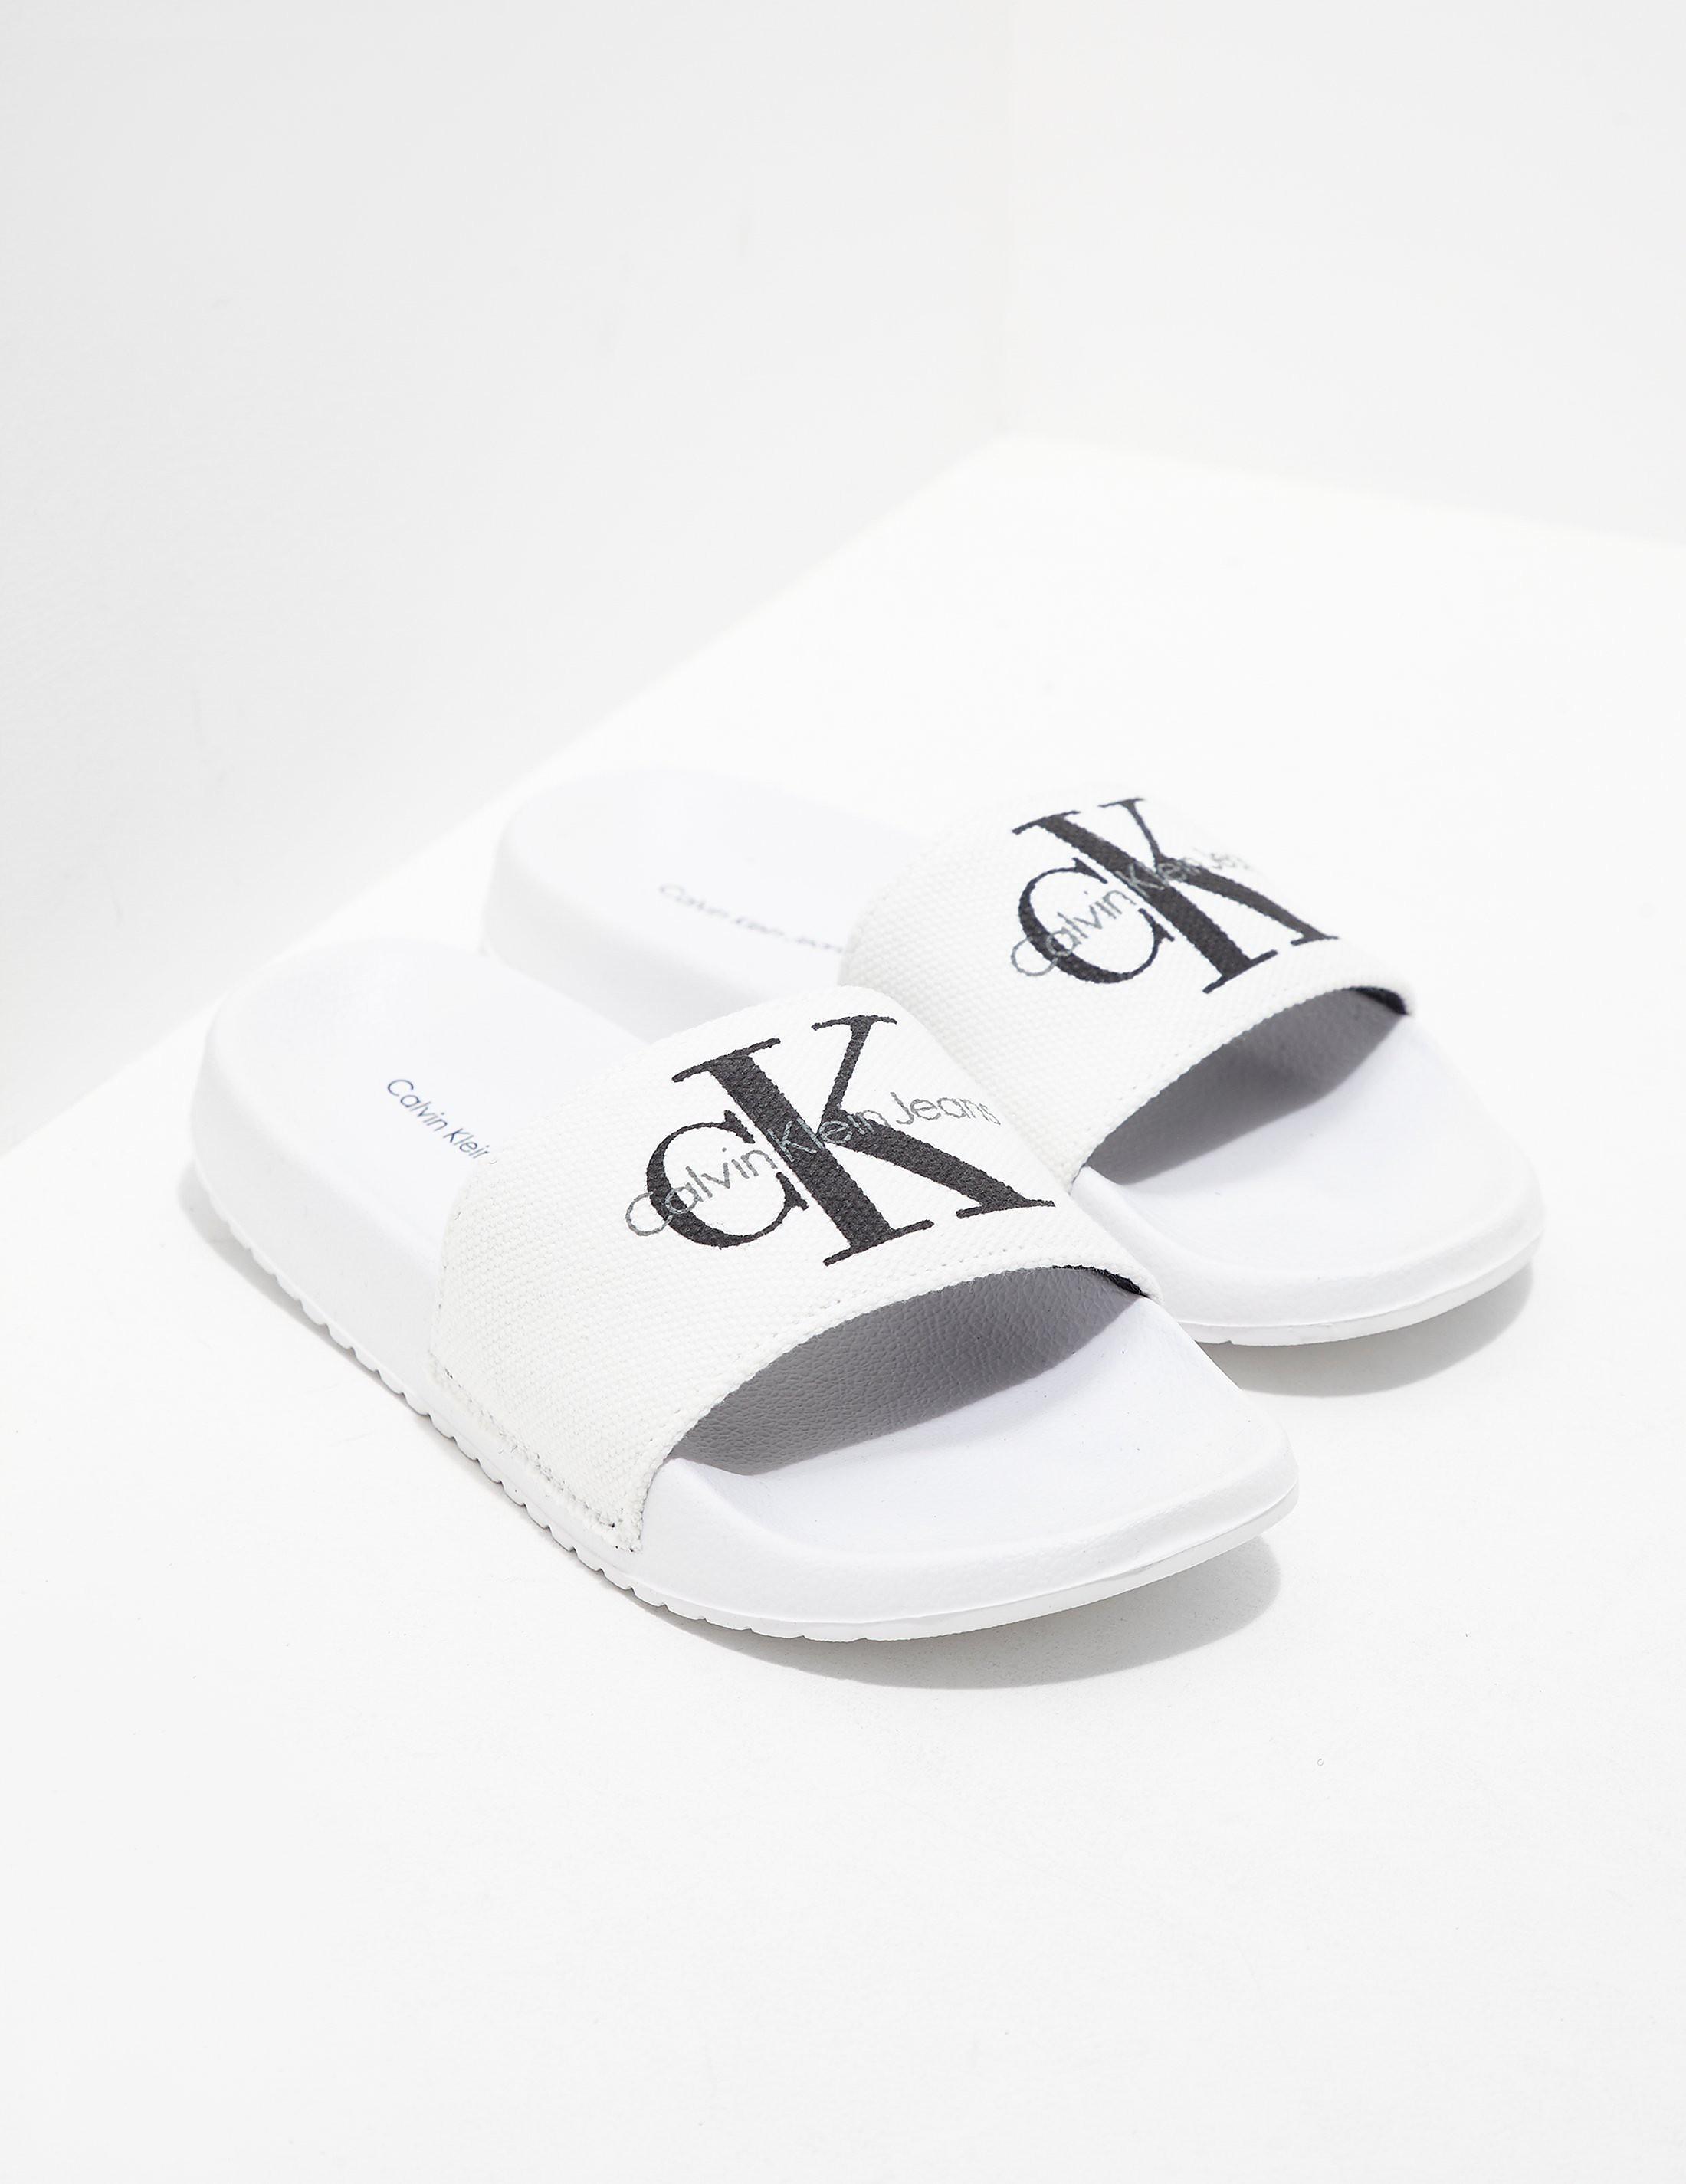 0590ca05f32a0e Womens Calvin Klein Jeans Chantal Slides Women s White